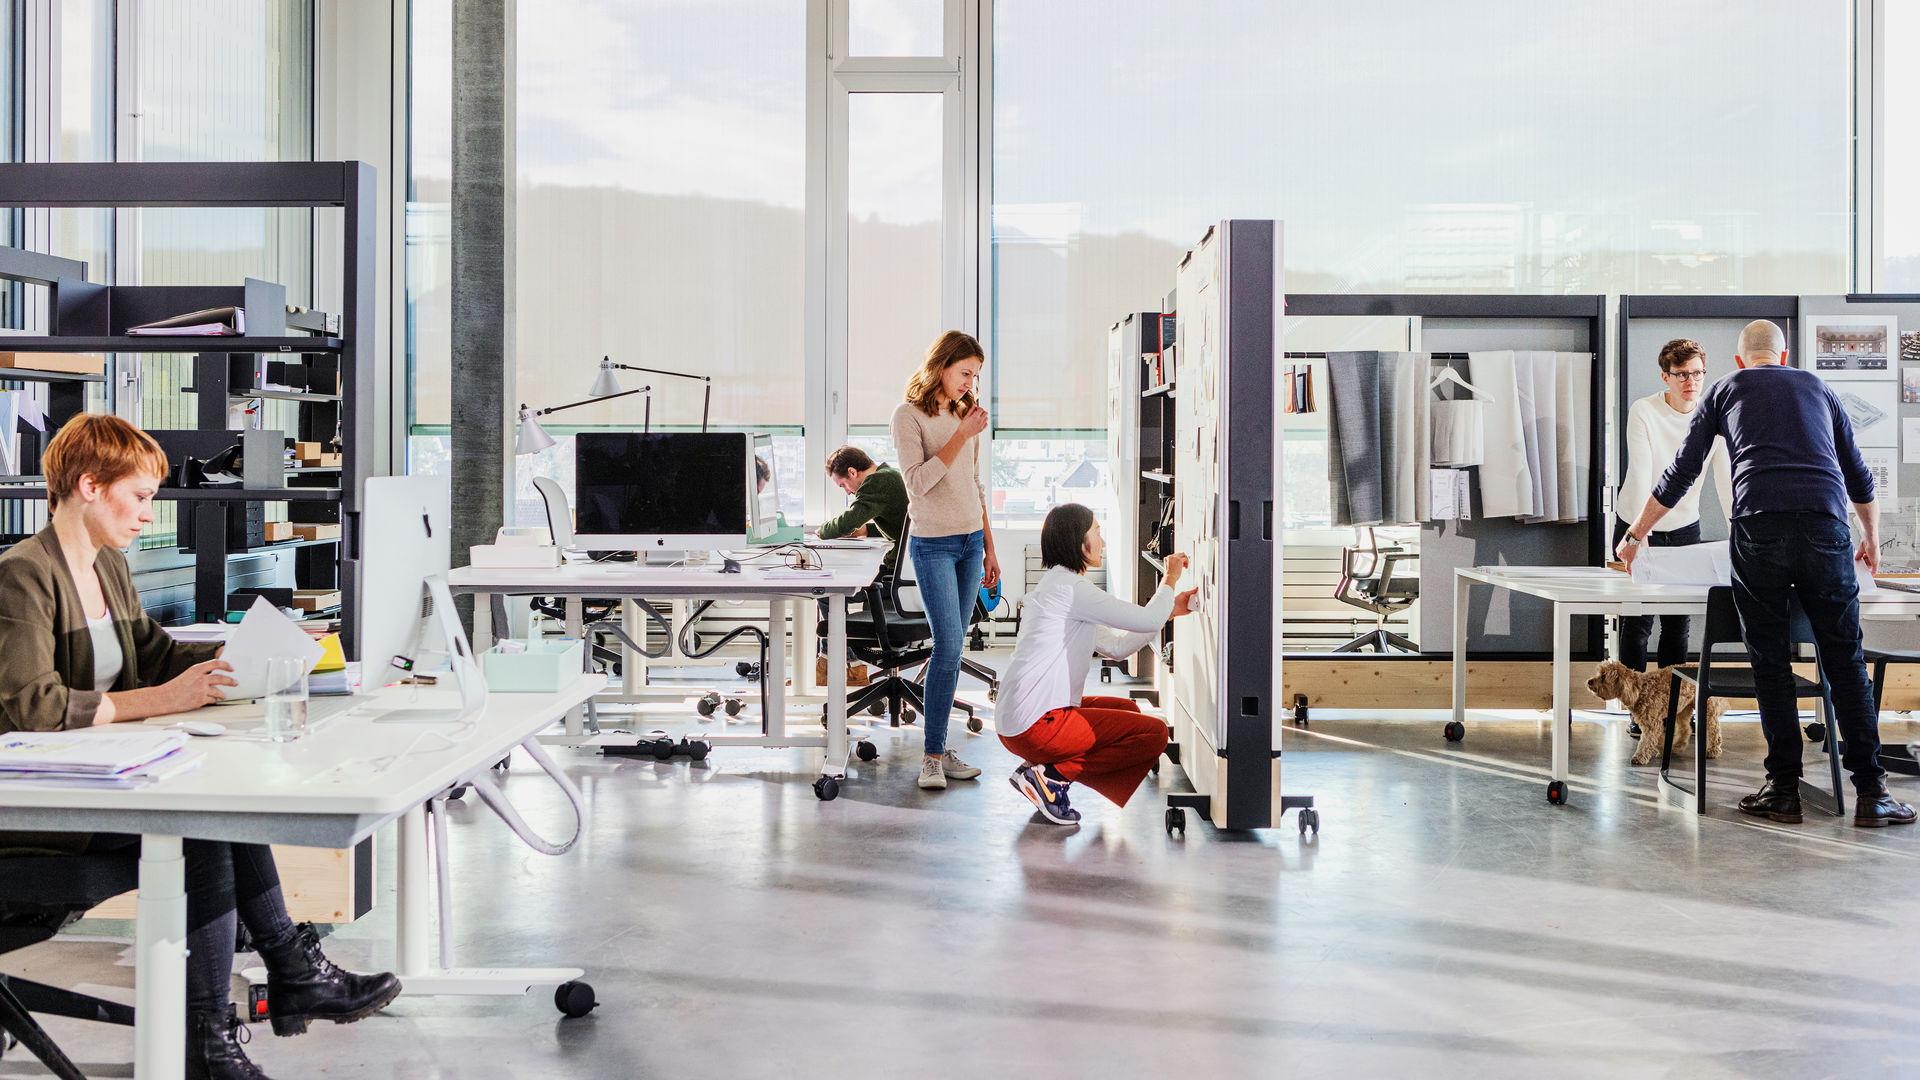 The_Dancing_Office_Studio Hürlemann_1057 Fenster_web_16-9